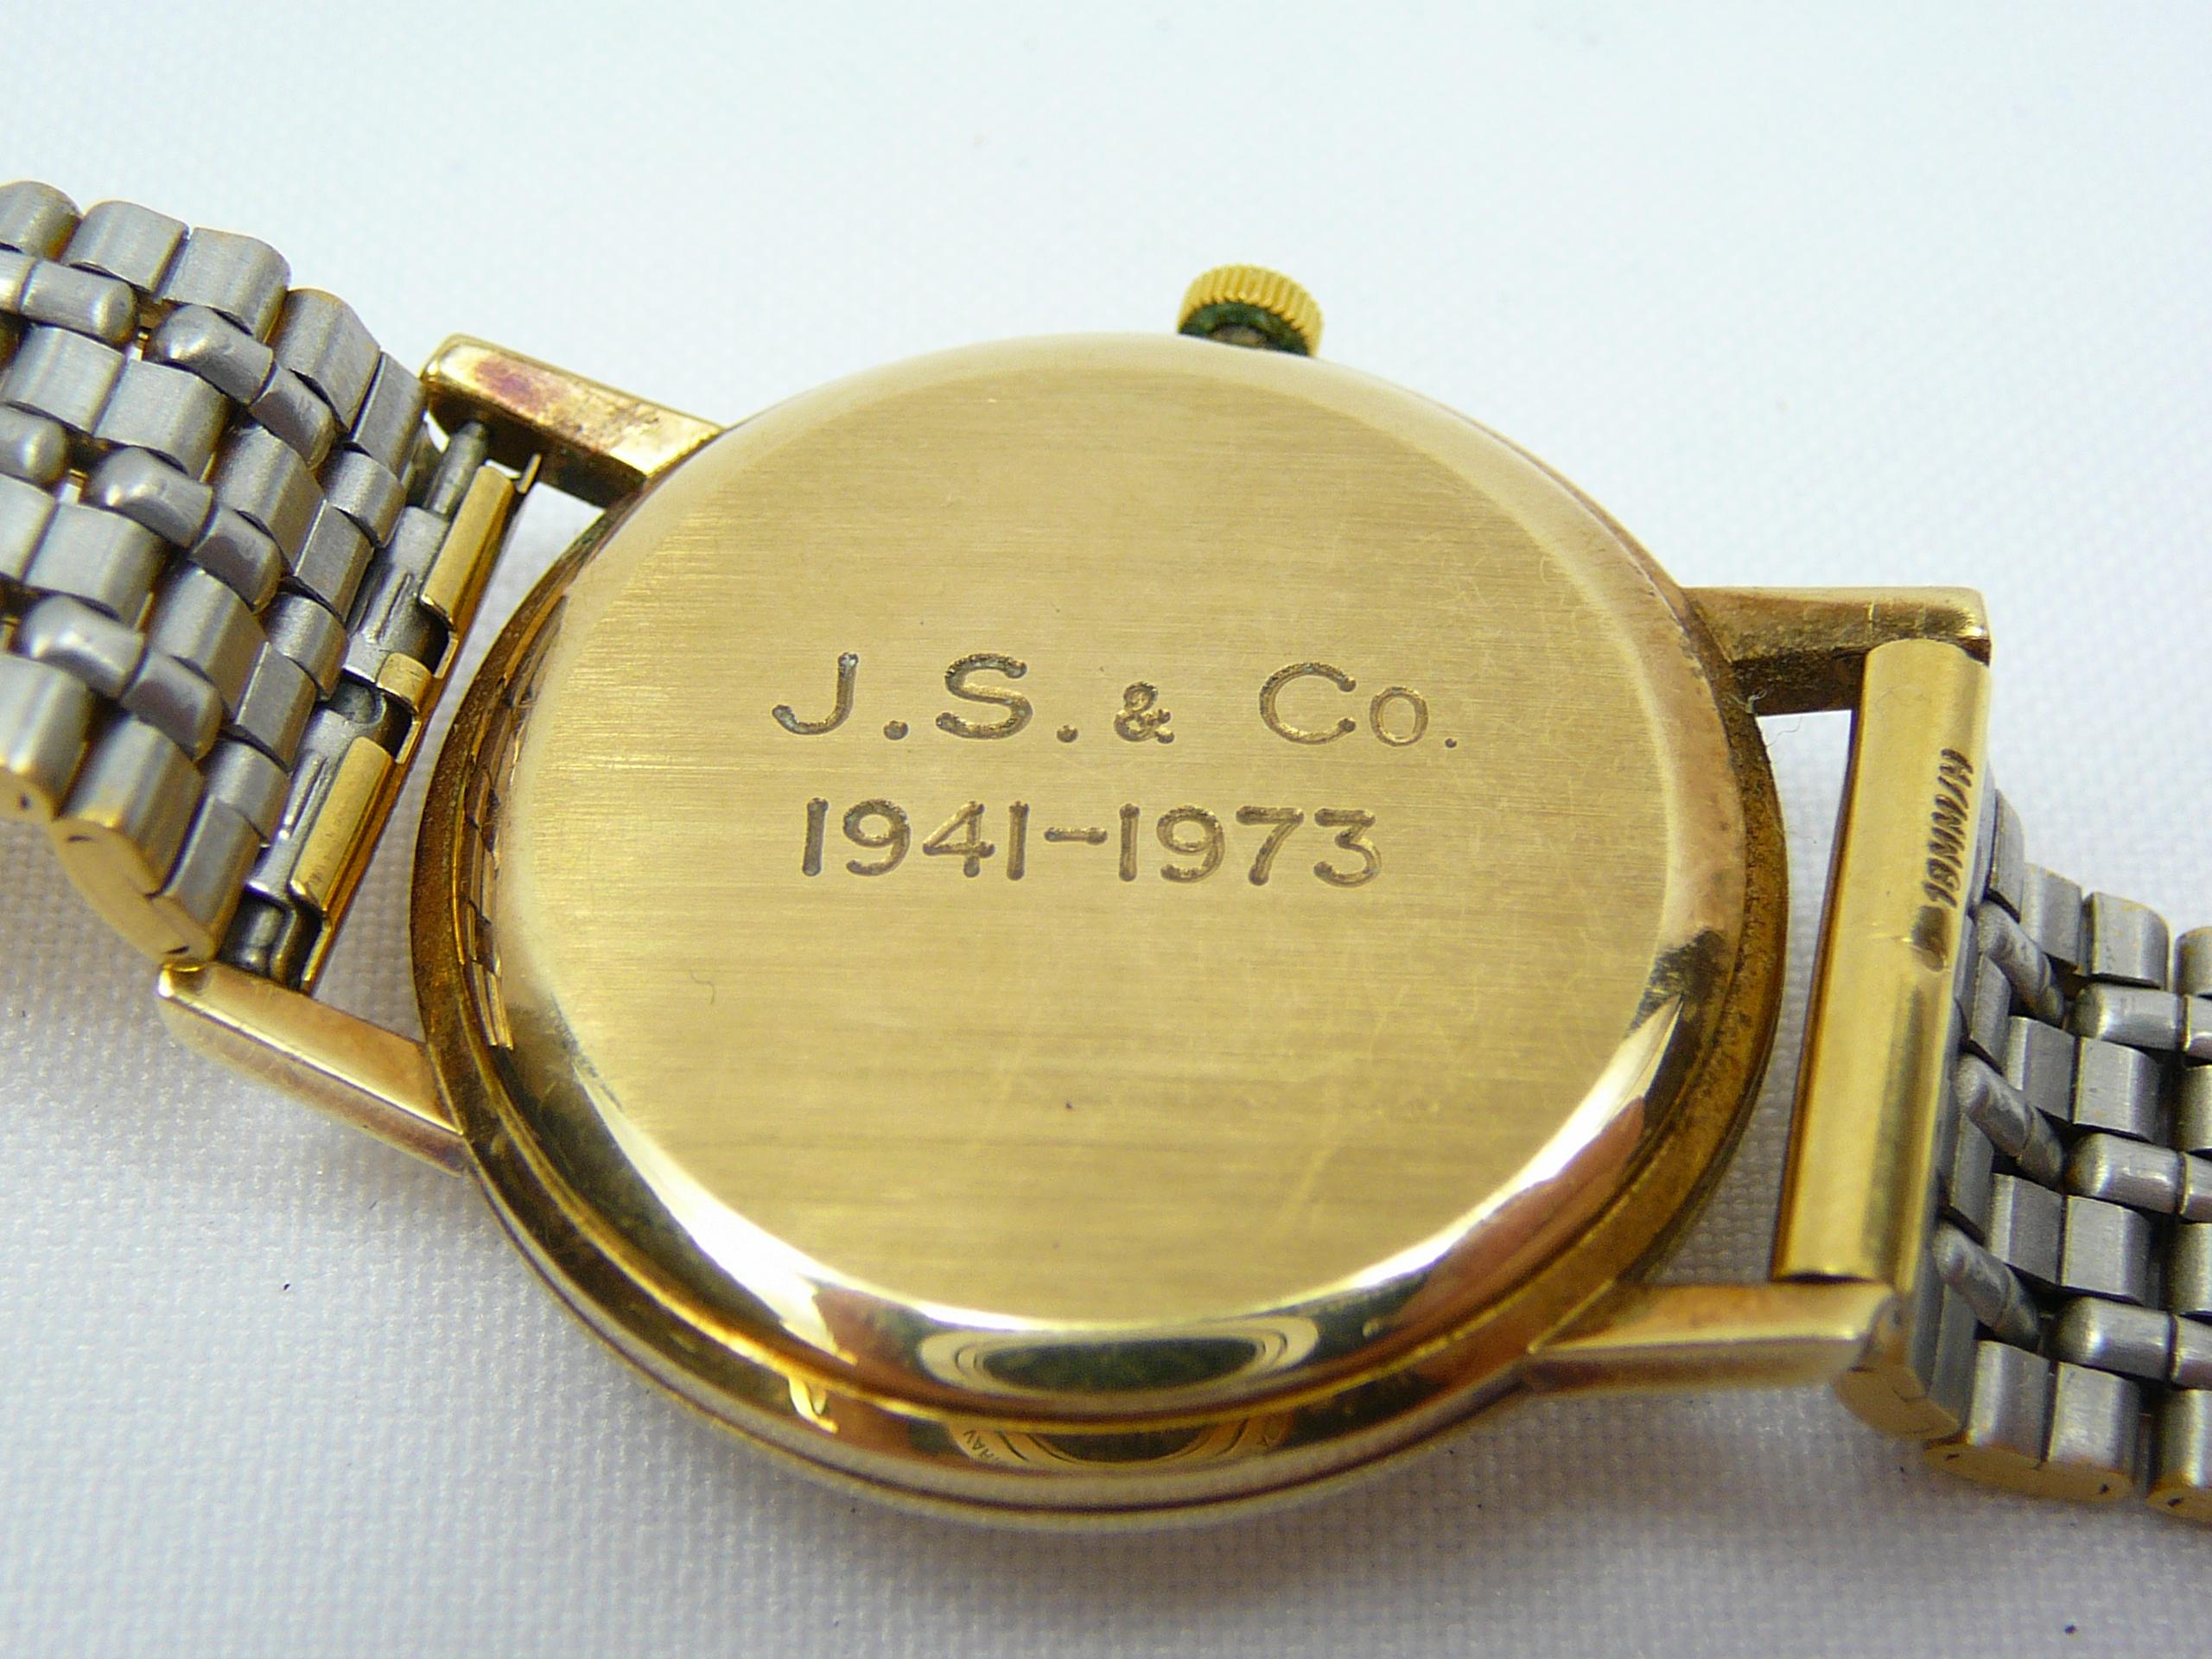 Gents Vintage Gold Longines Wrist Watch - Image 4 of 5